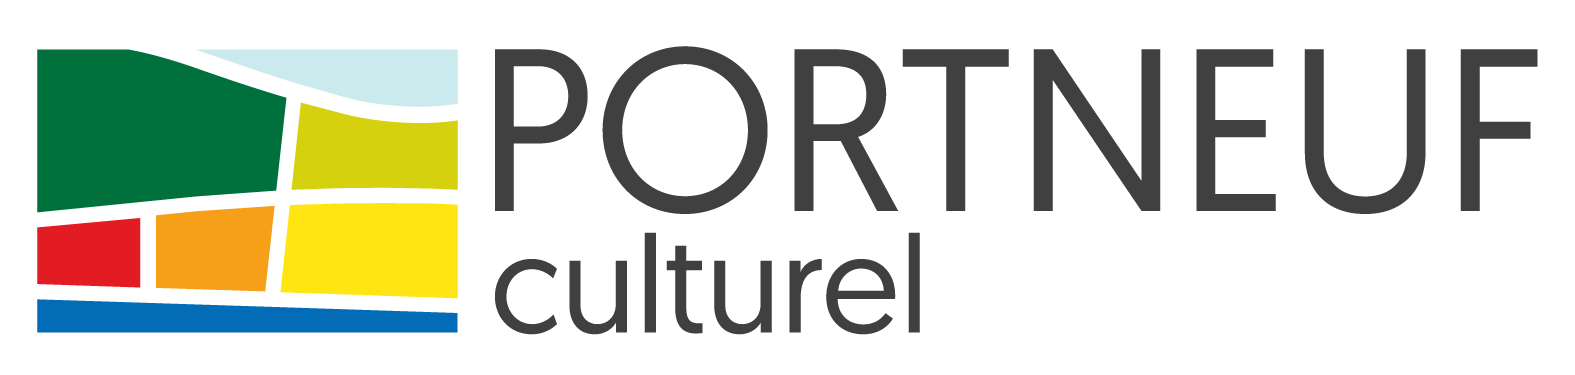 Portneuf culturel